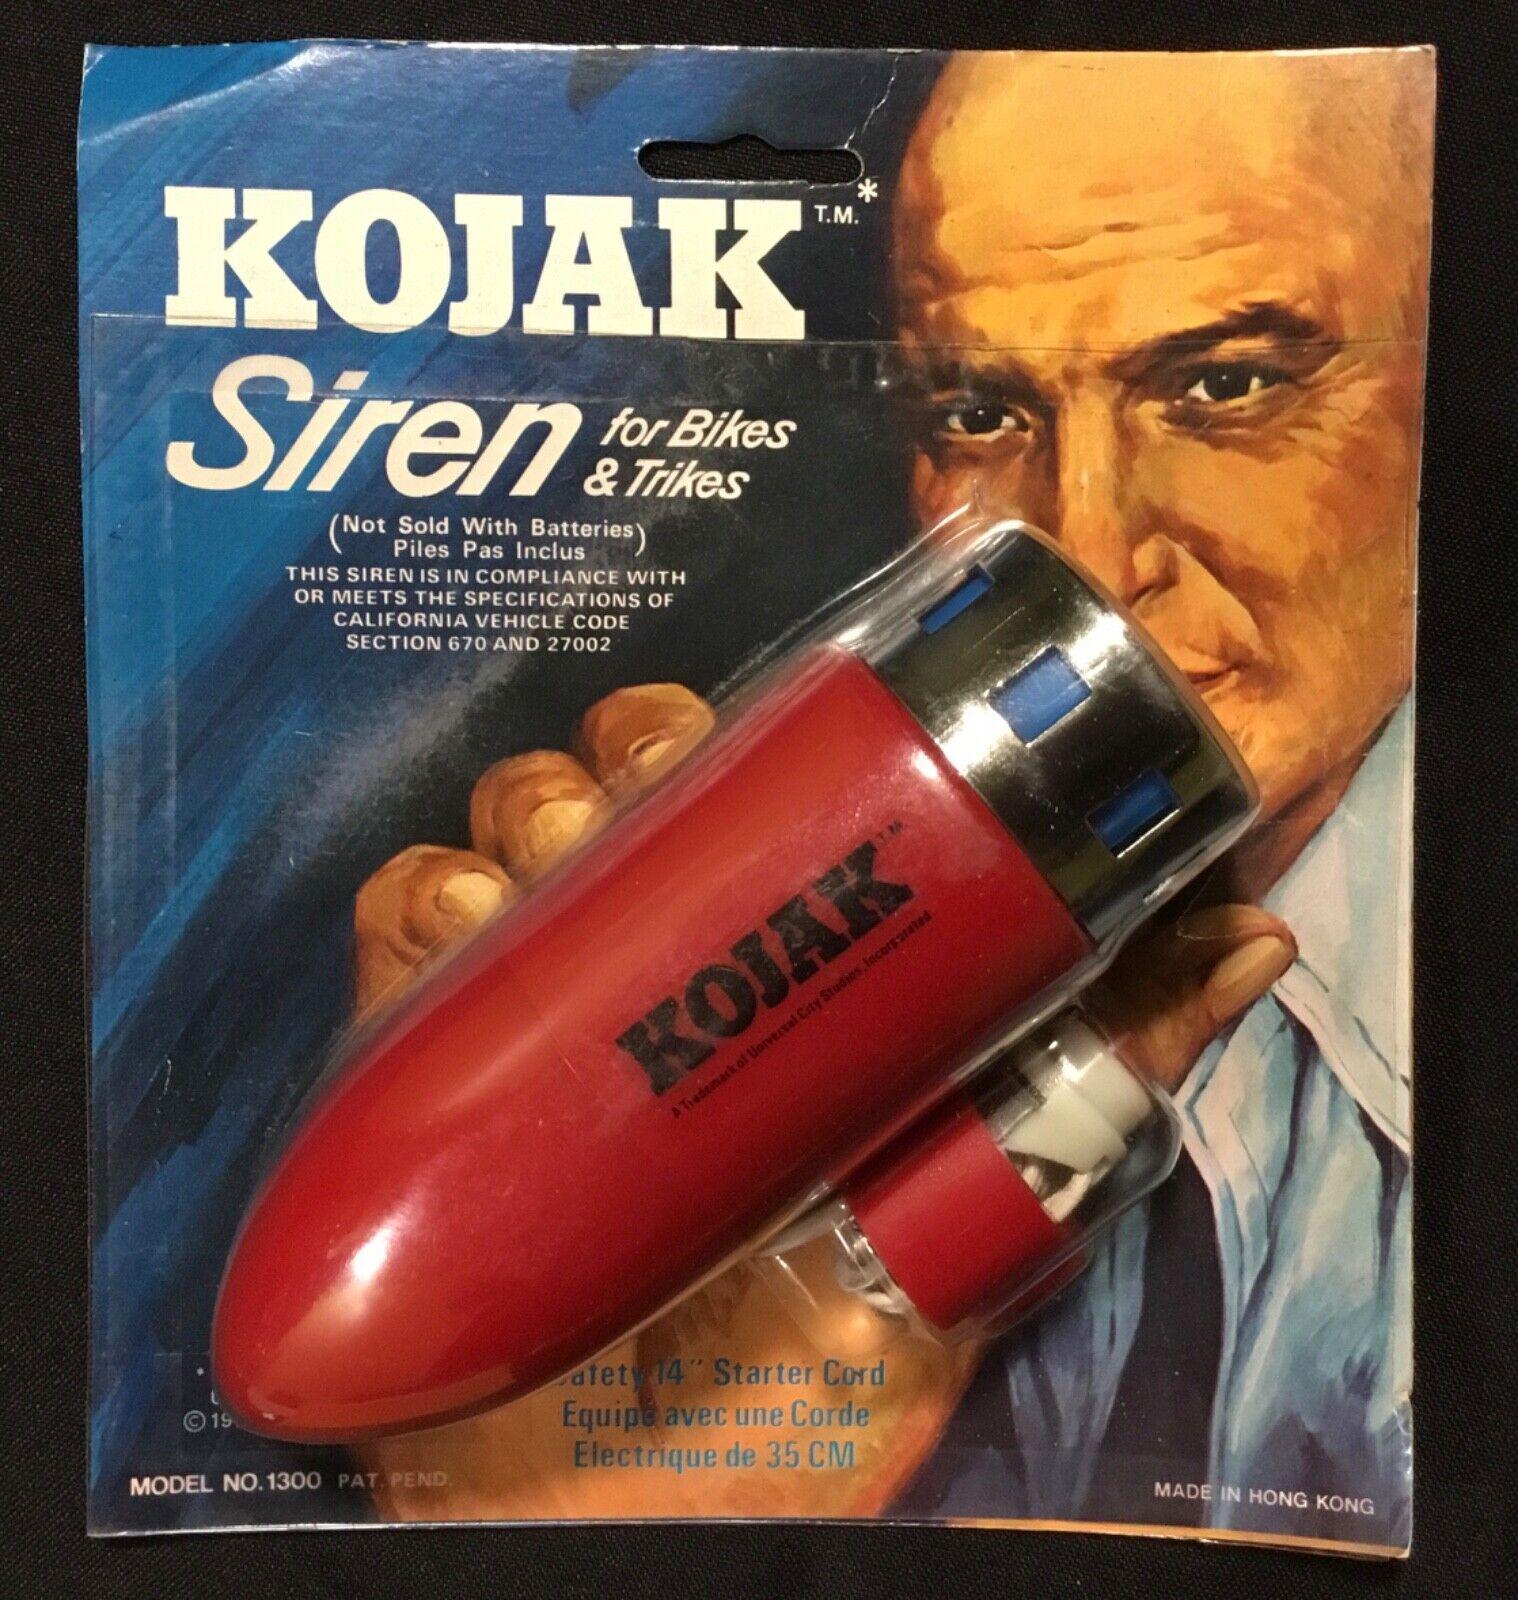 Kojak Bike Siren- 5 awesome things on ebay this week